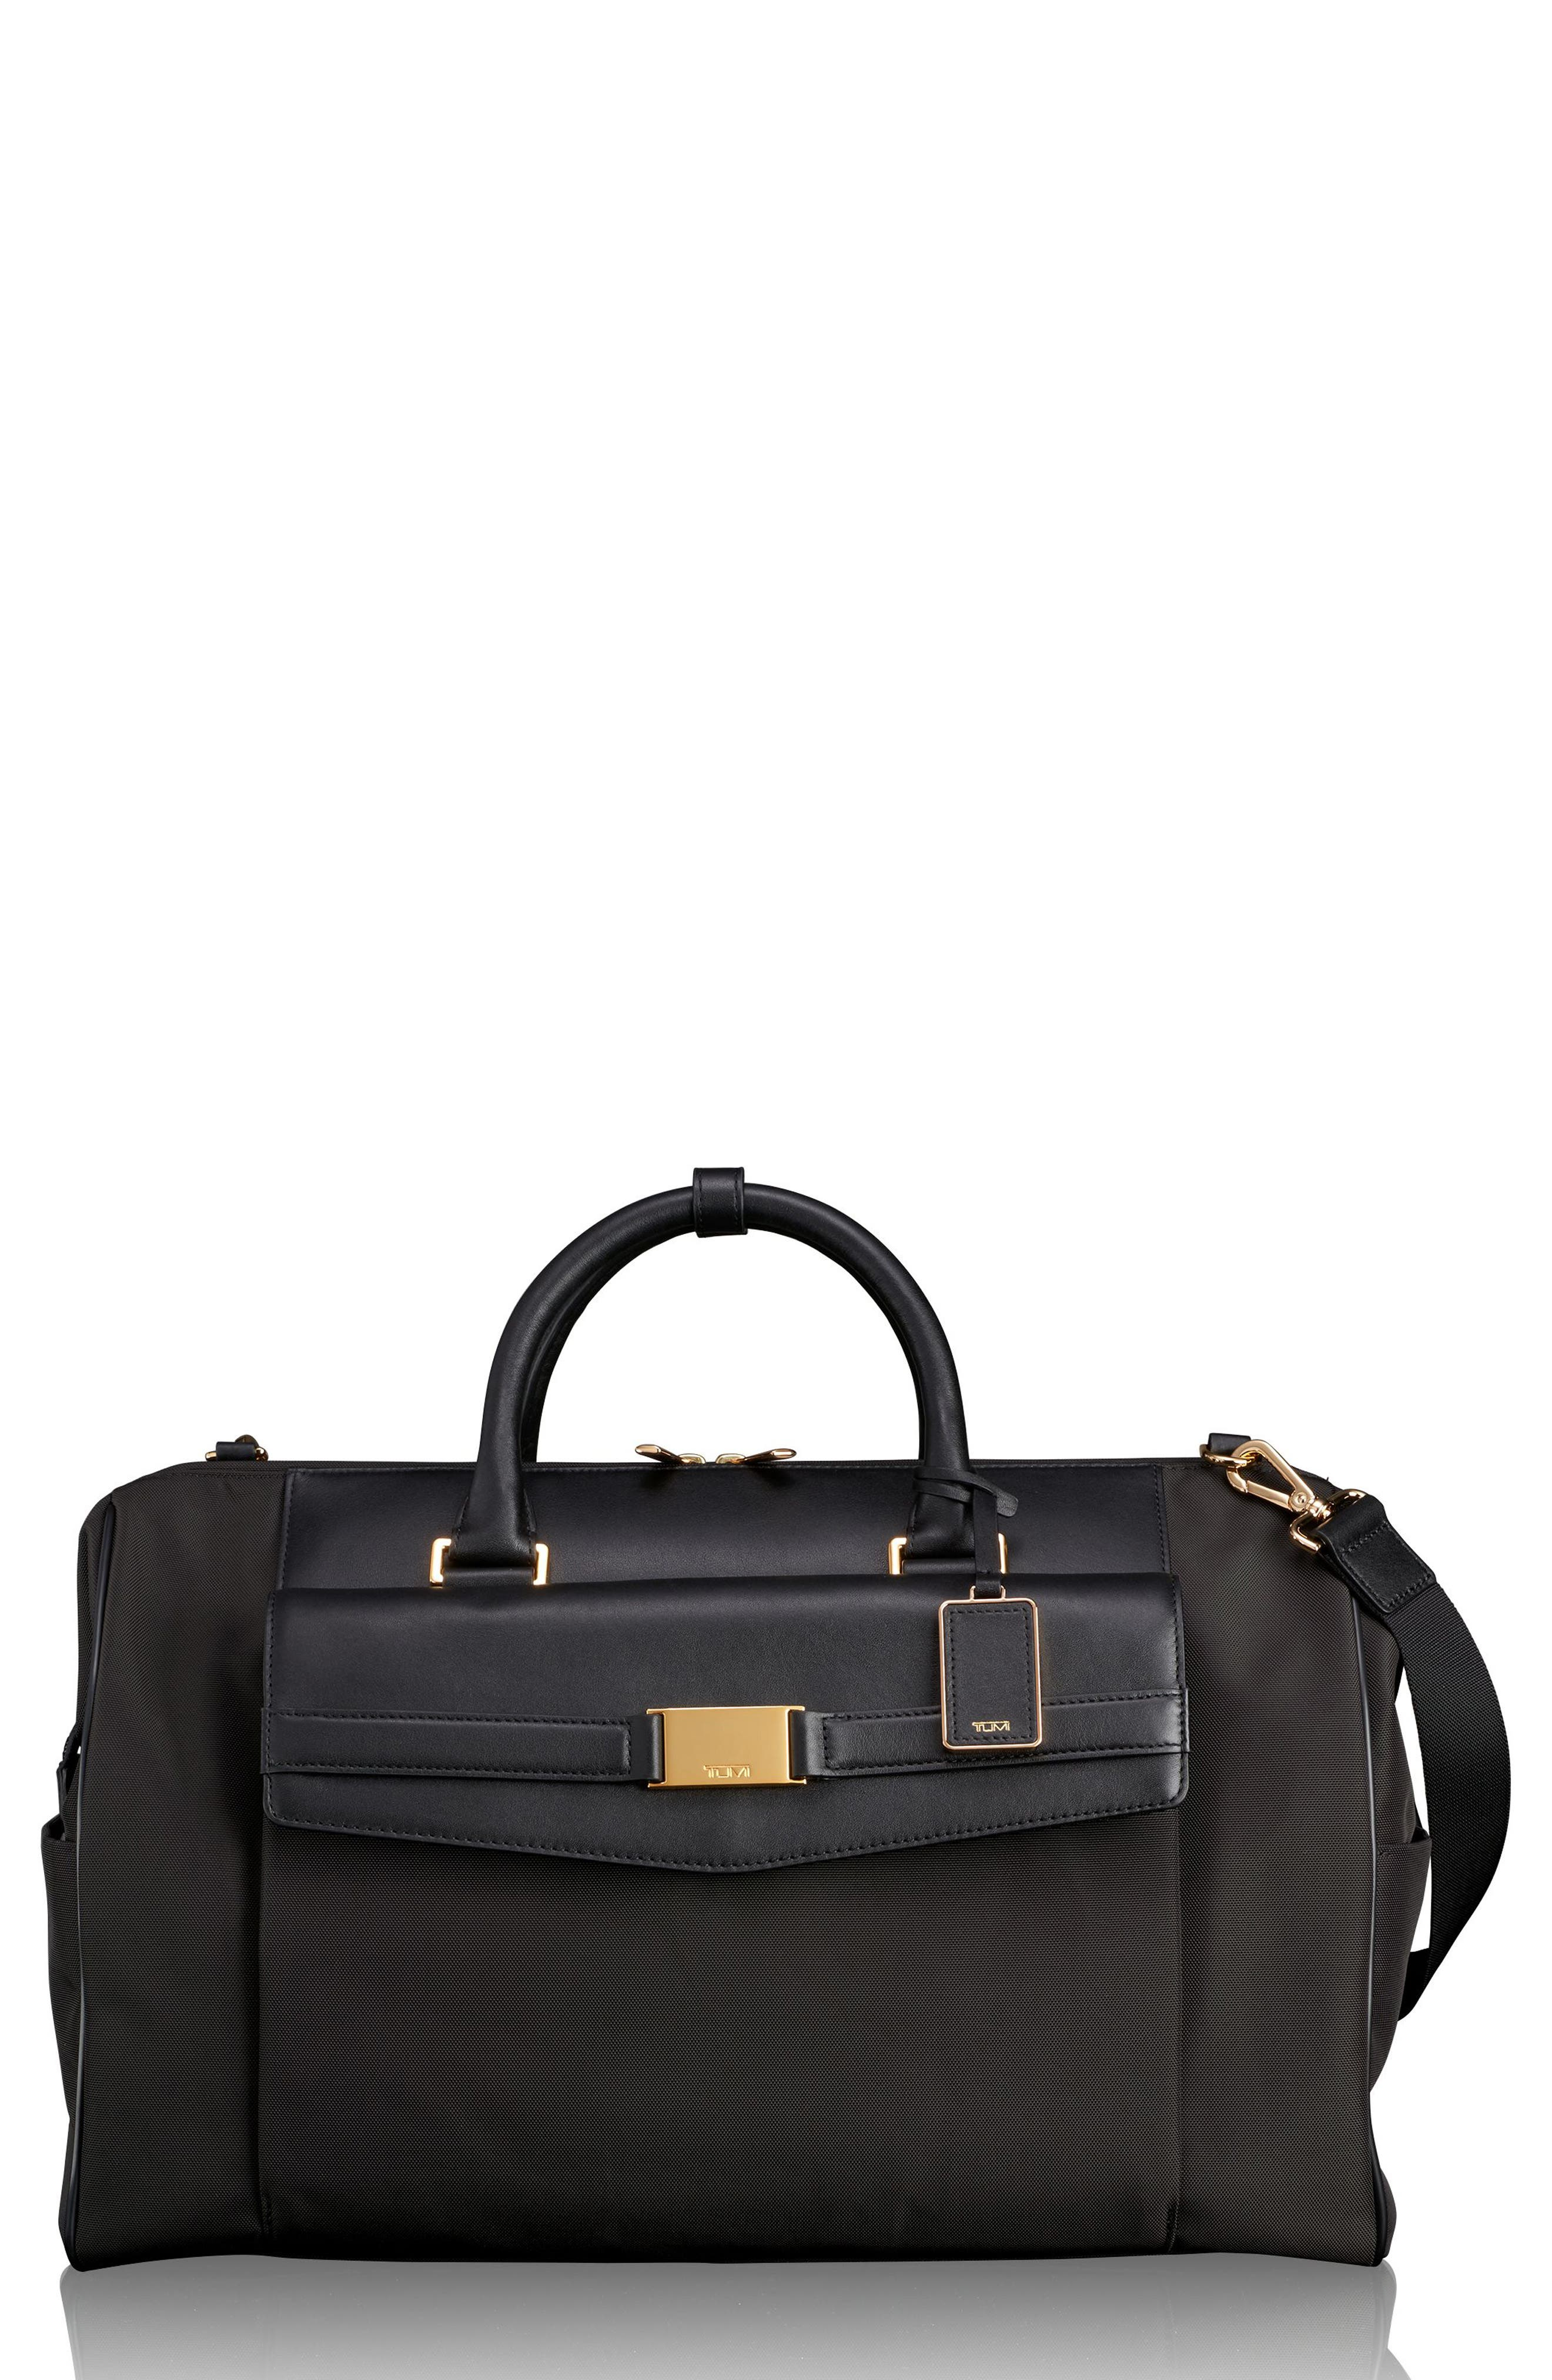 Larkin - Allendale Nylon Duffel Bag,                             Main thumbnail 1, color,                             001